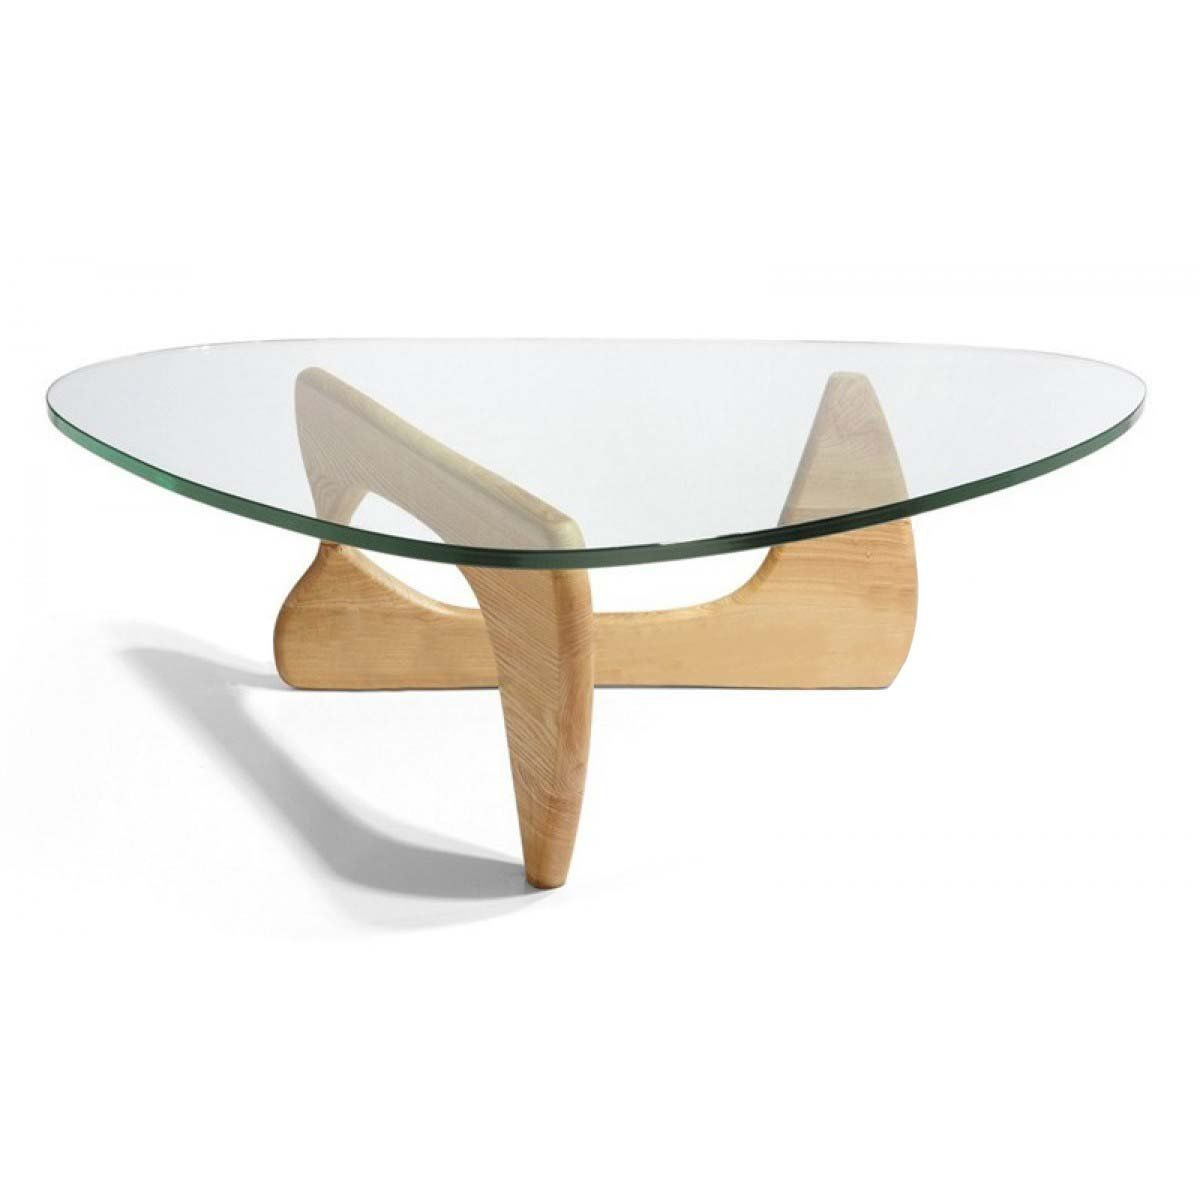 Isamu Noguchi Replica Coffee Table Simple Style Co Noguchi Coffee Table Coffee Table Isamu Noguchi Coffee Table [ 1200 x 1200 Pixel ]